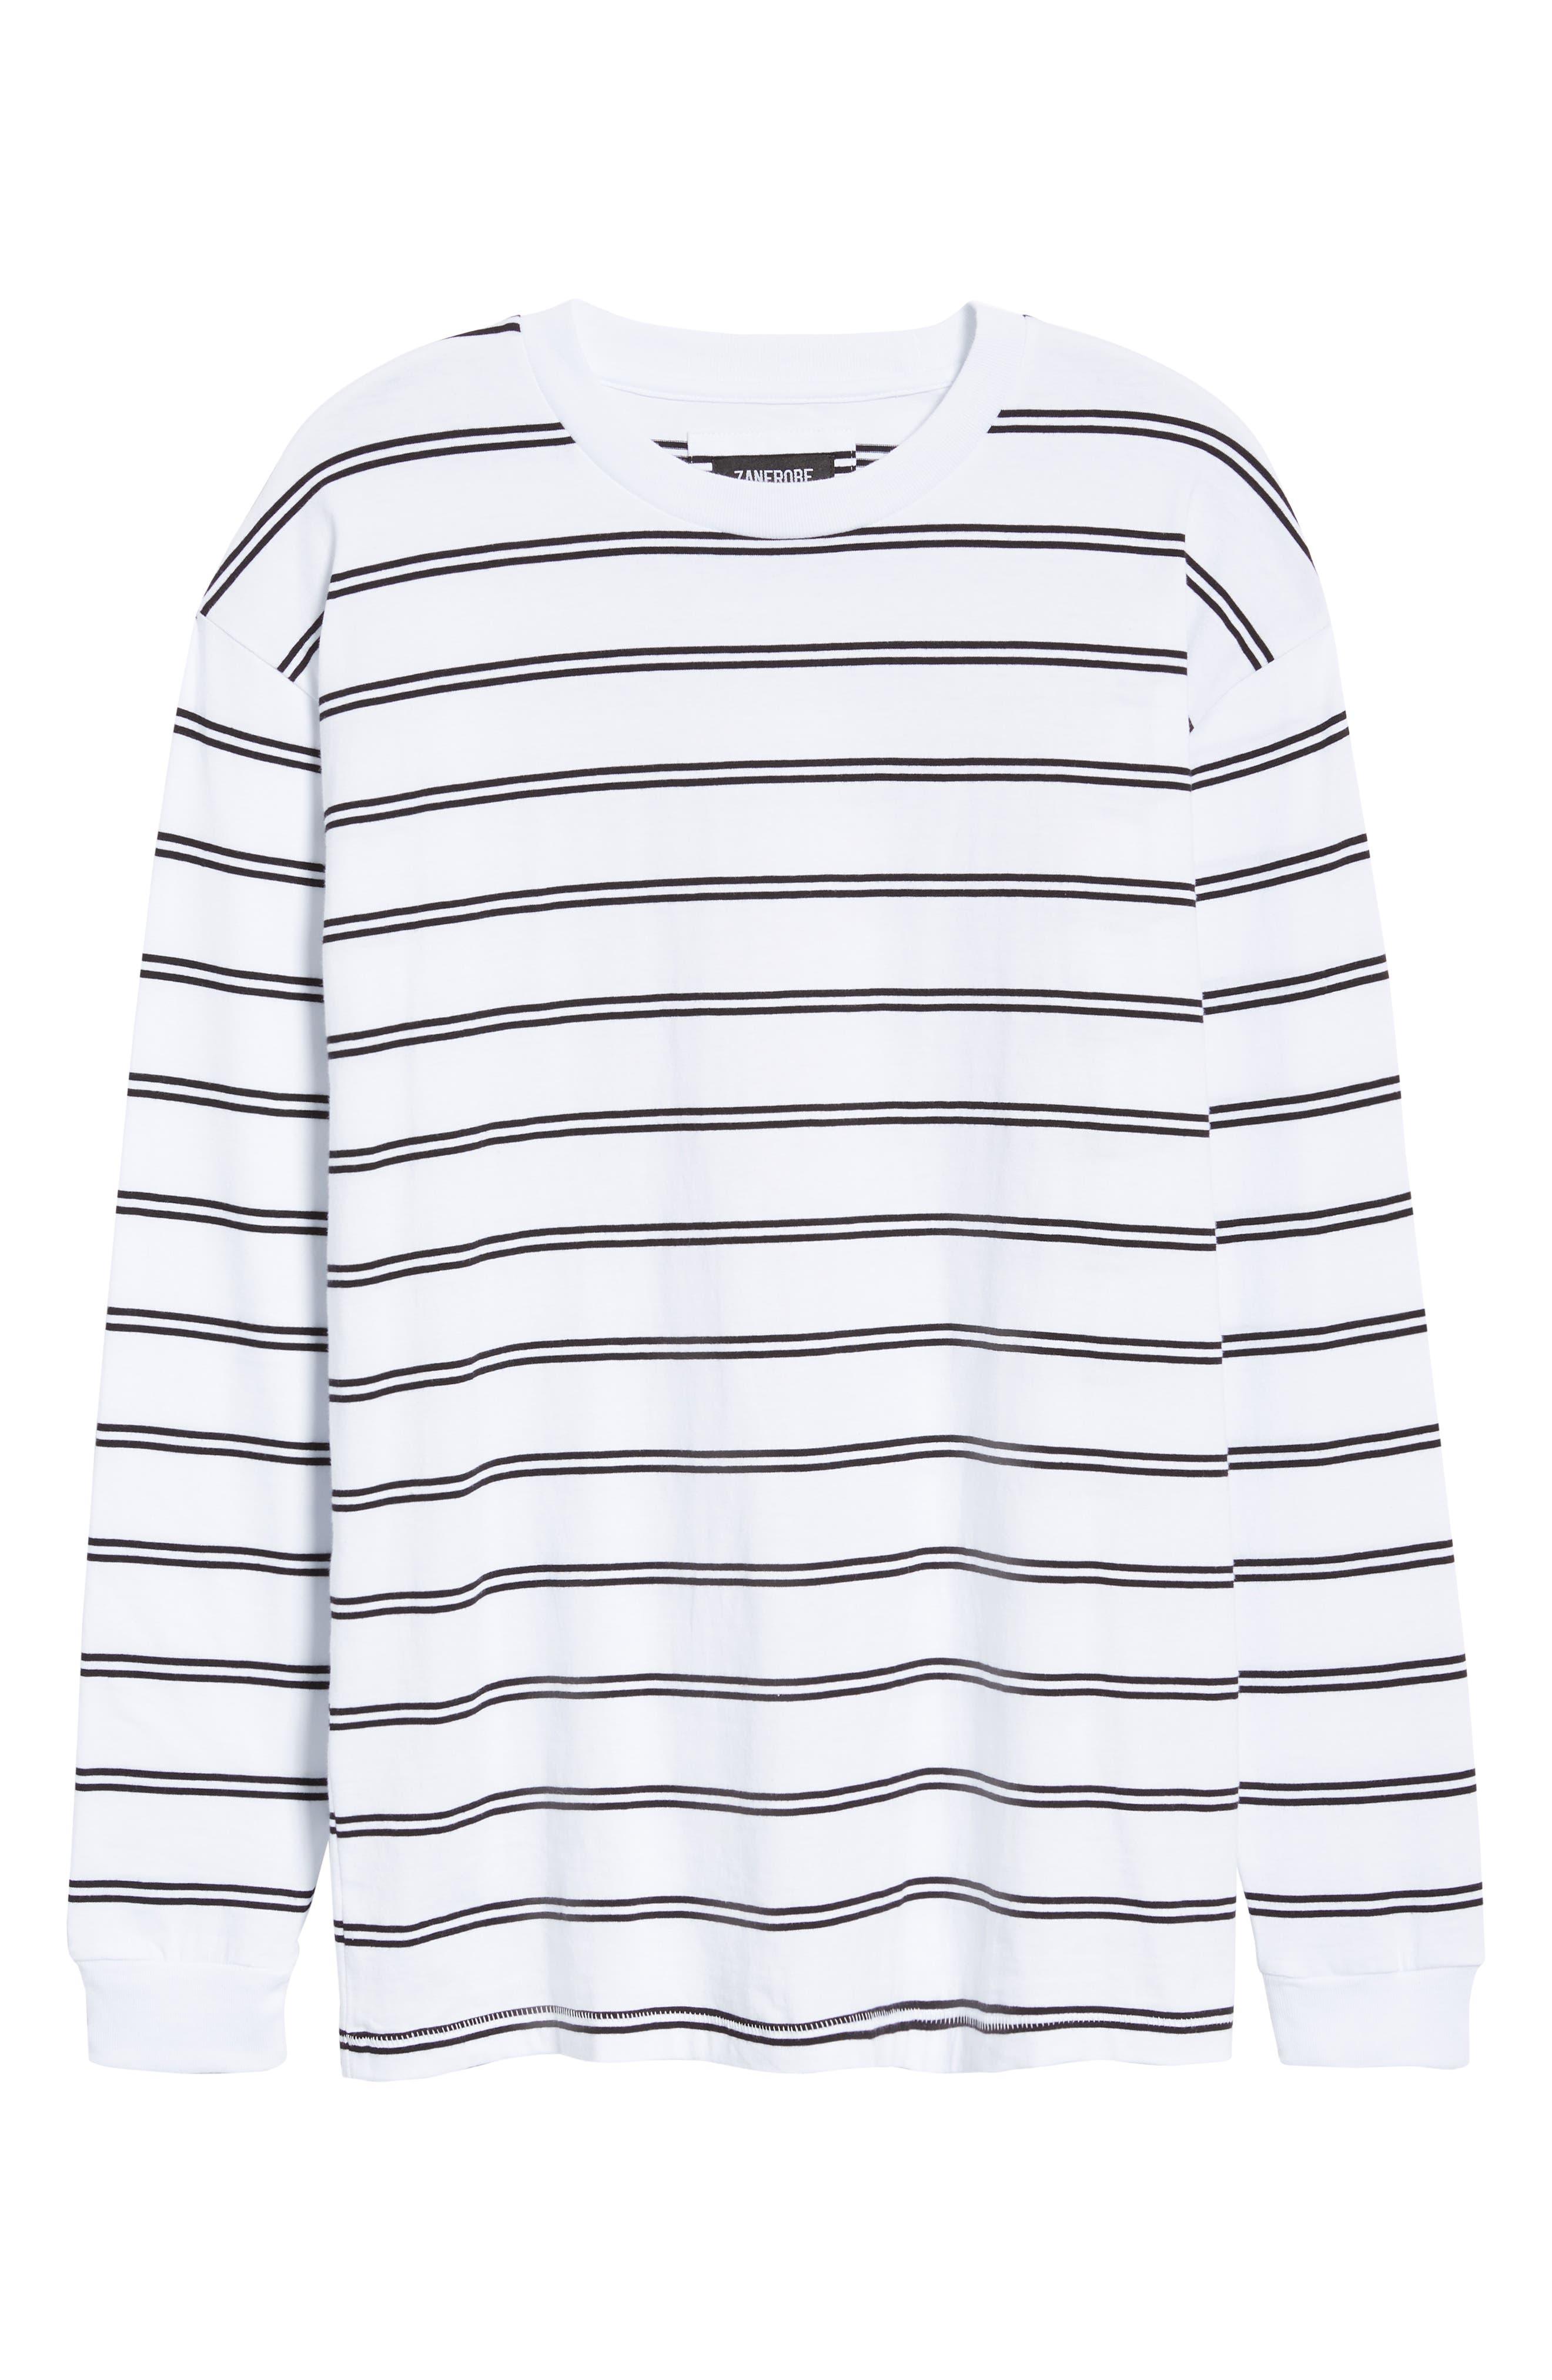 Channel Box Long Sleeve T-Shirt,                             Alternate thumbnail 6, color,                             100